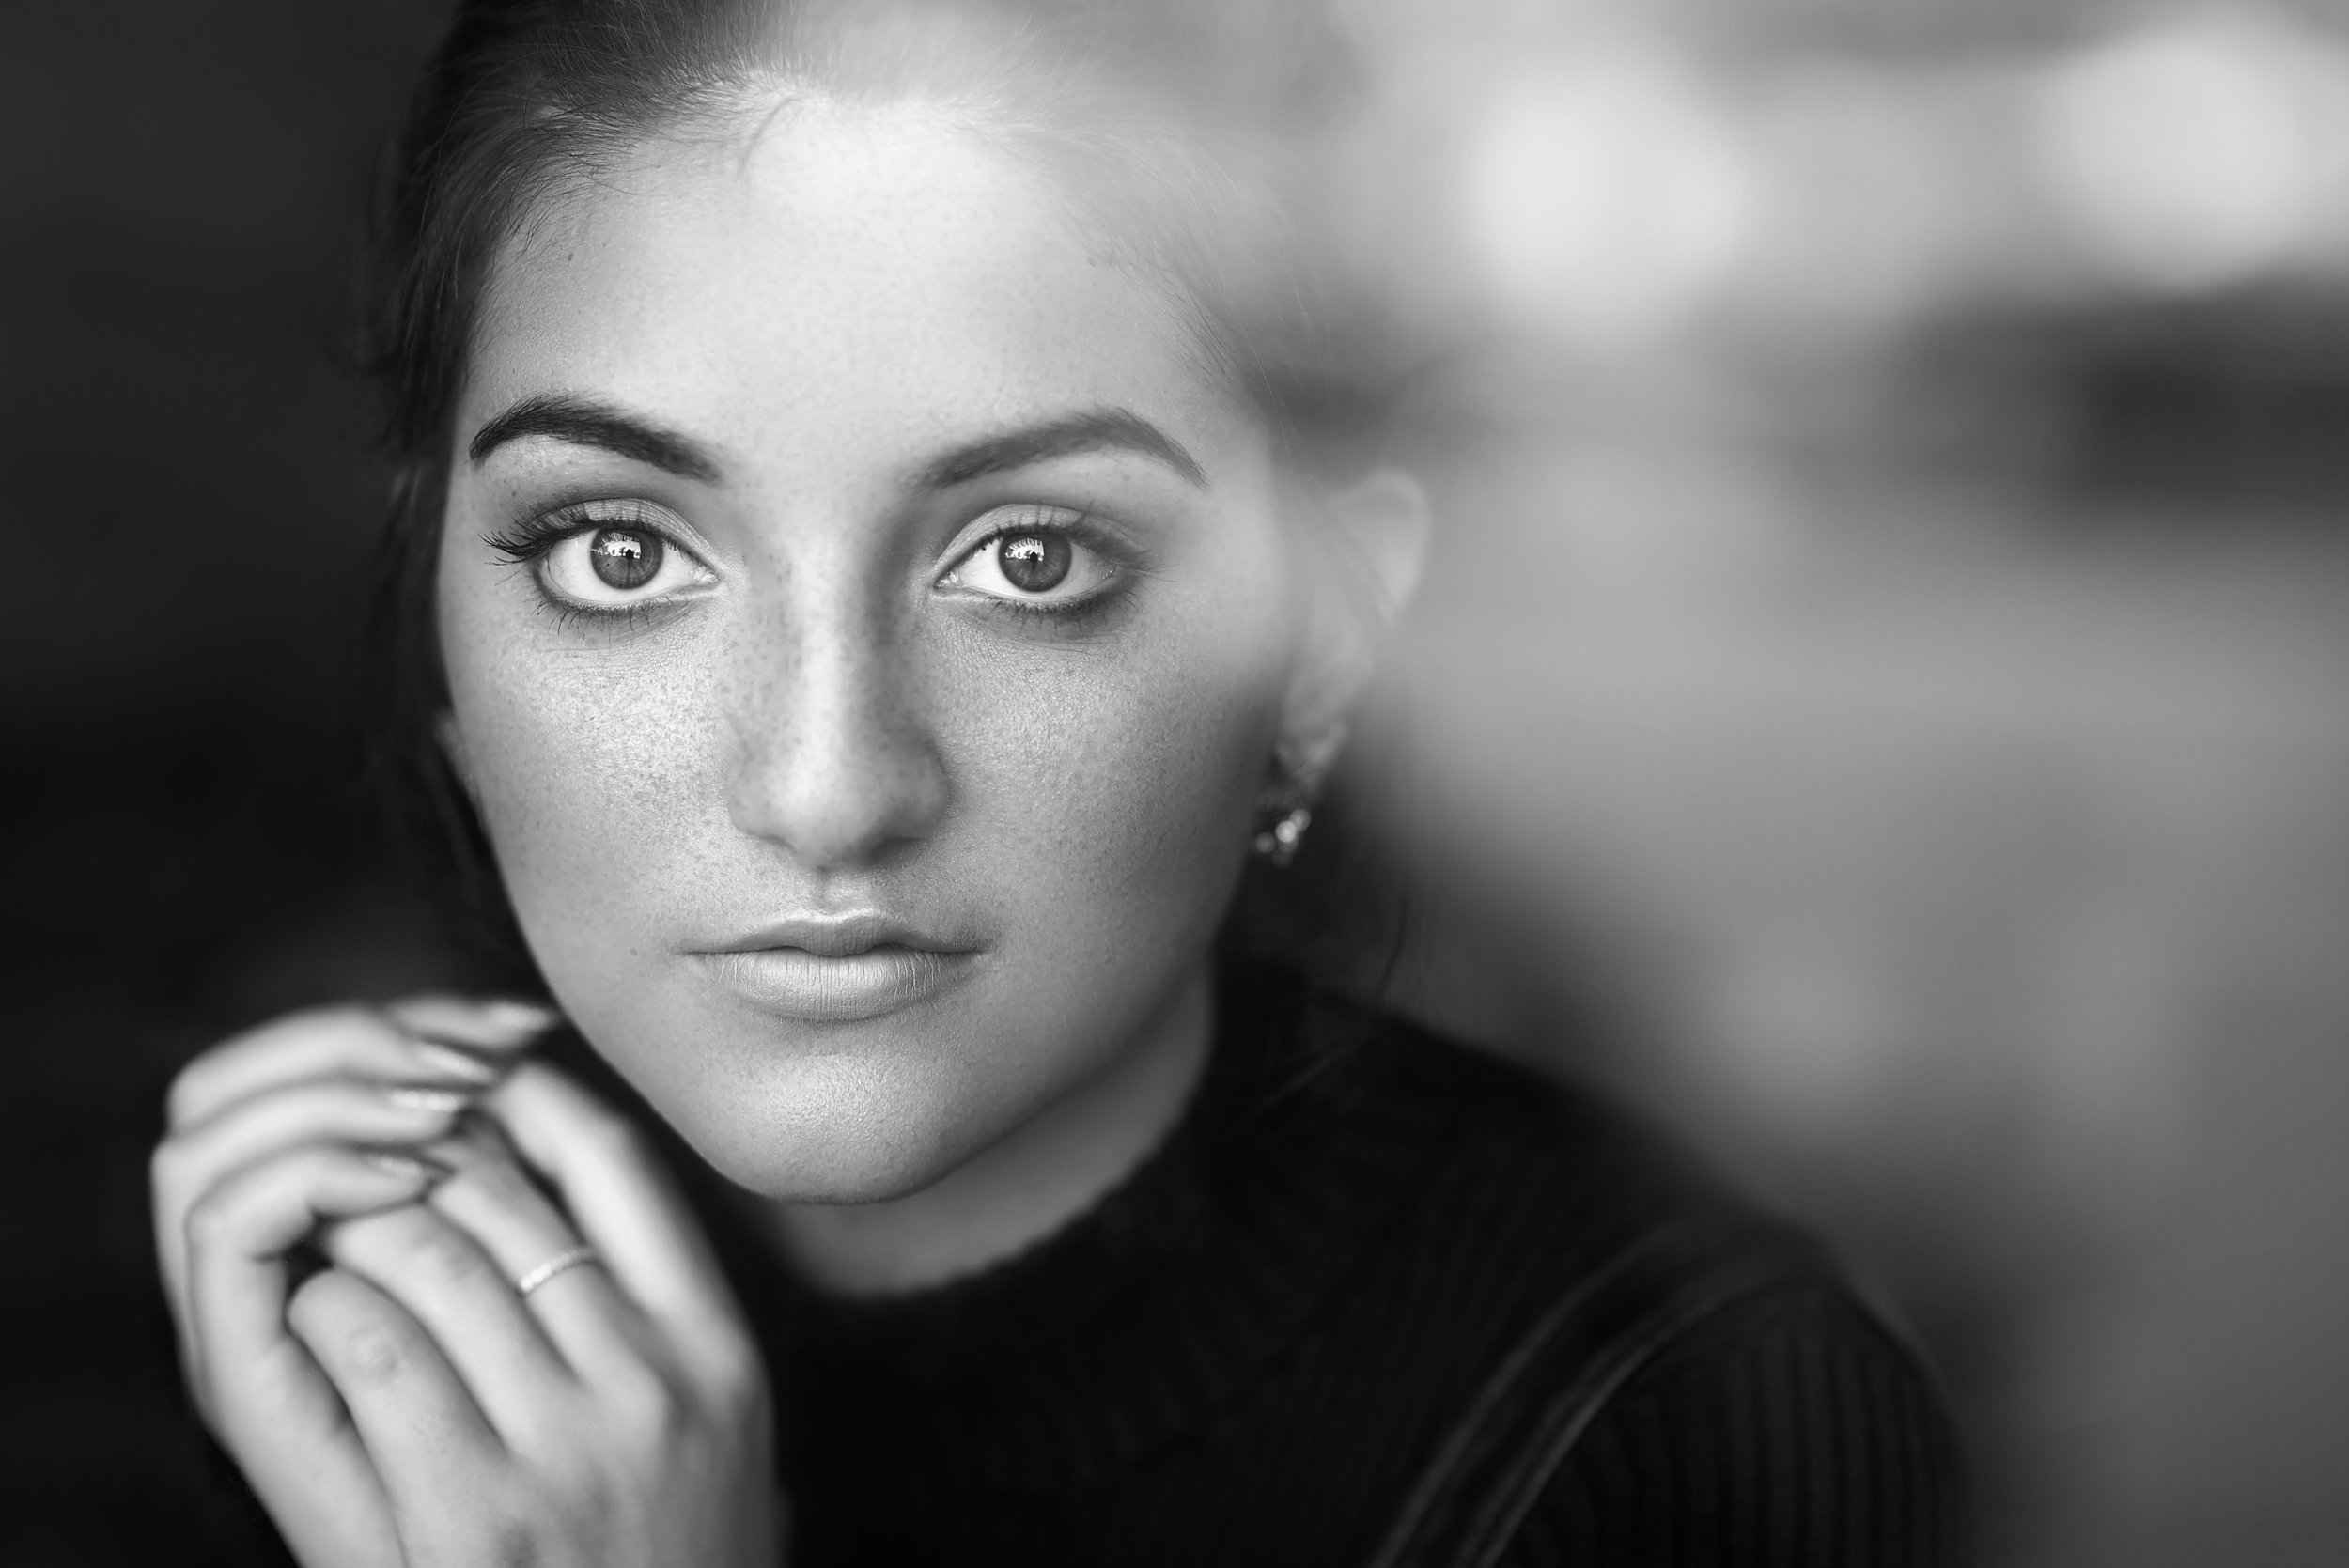 headshot-photographer-indianapolis-personal-branding-7-3.jpg